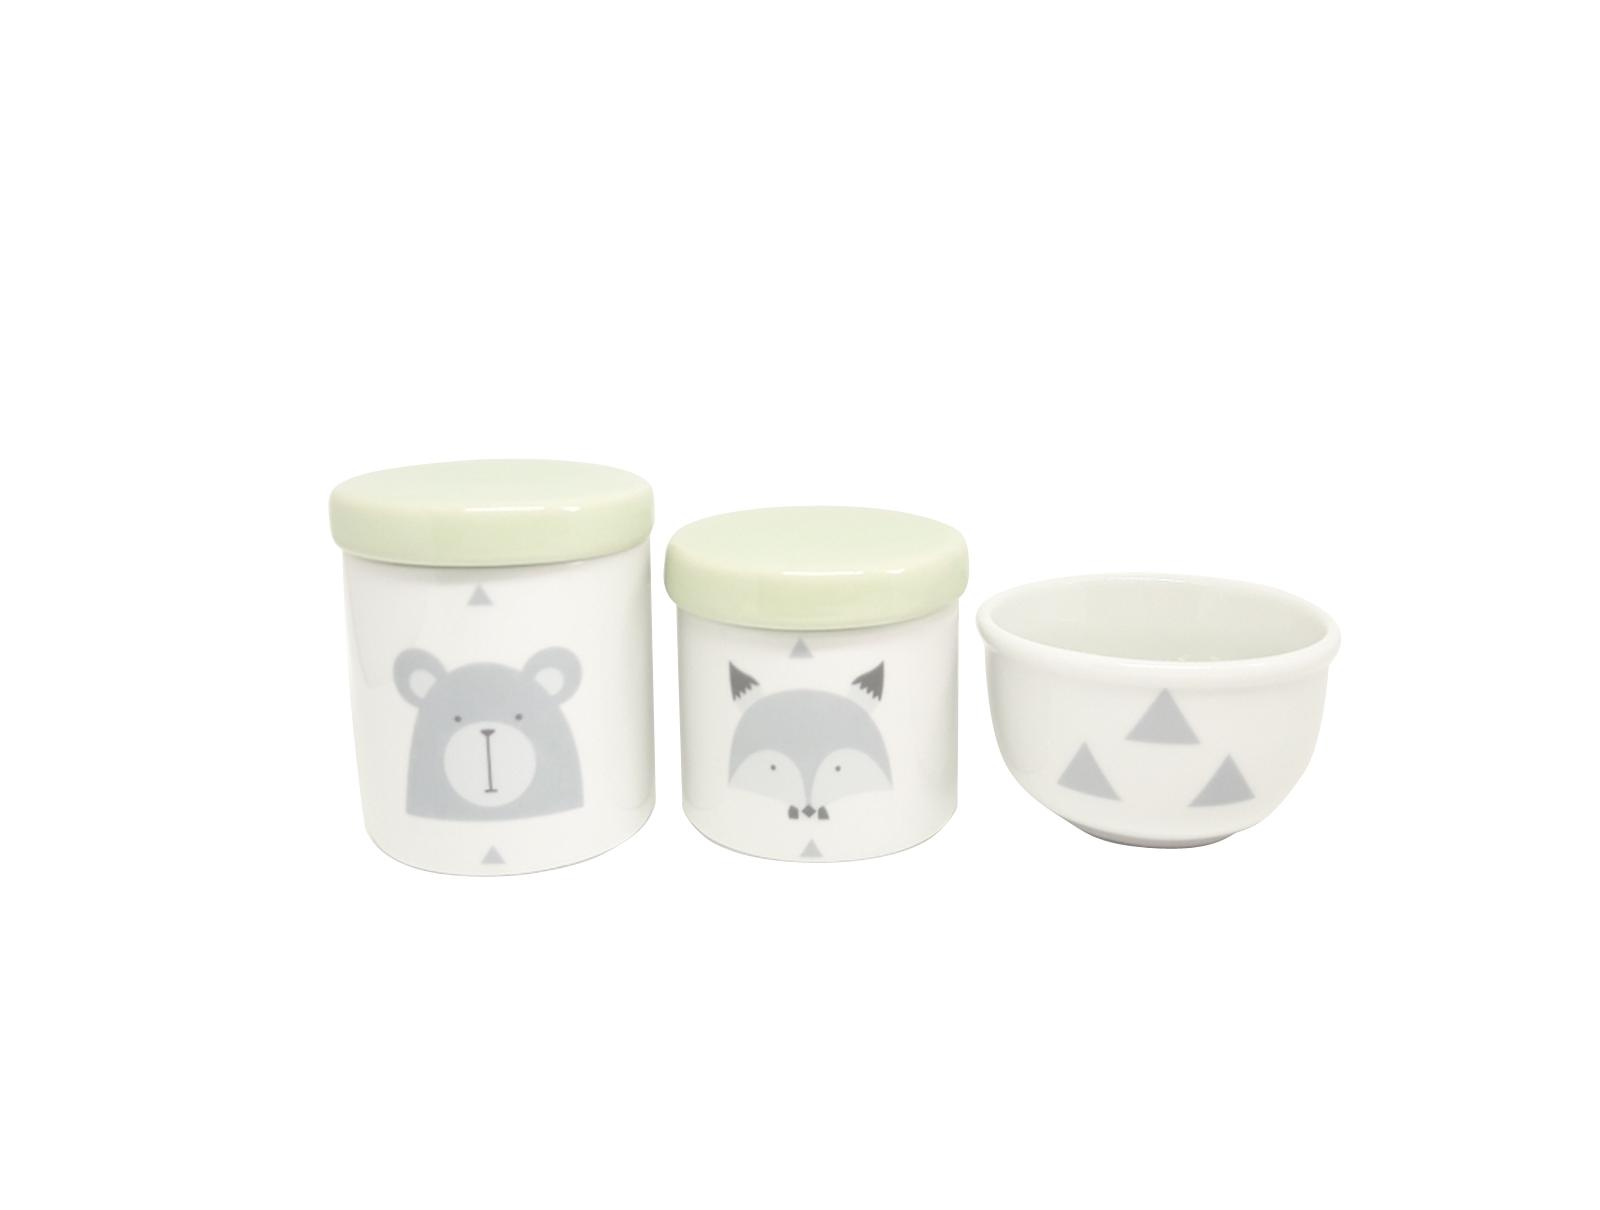 Kit Higiene Bebê Porcelana Escandinavo |Urso e Raposa | Geométrico| Tampa Verde